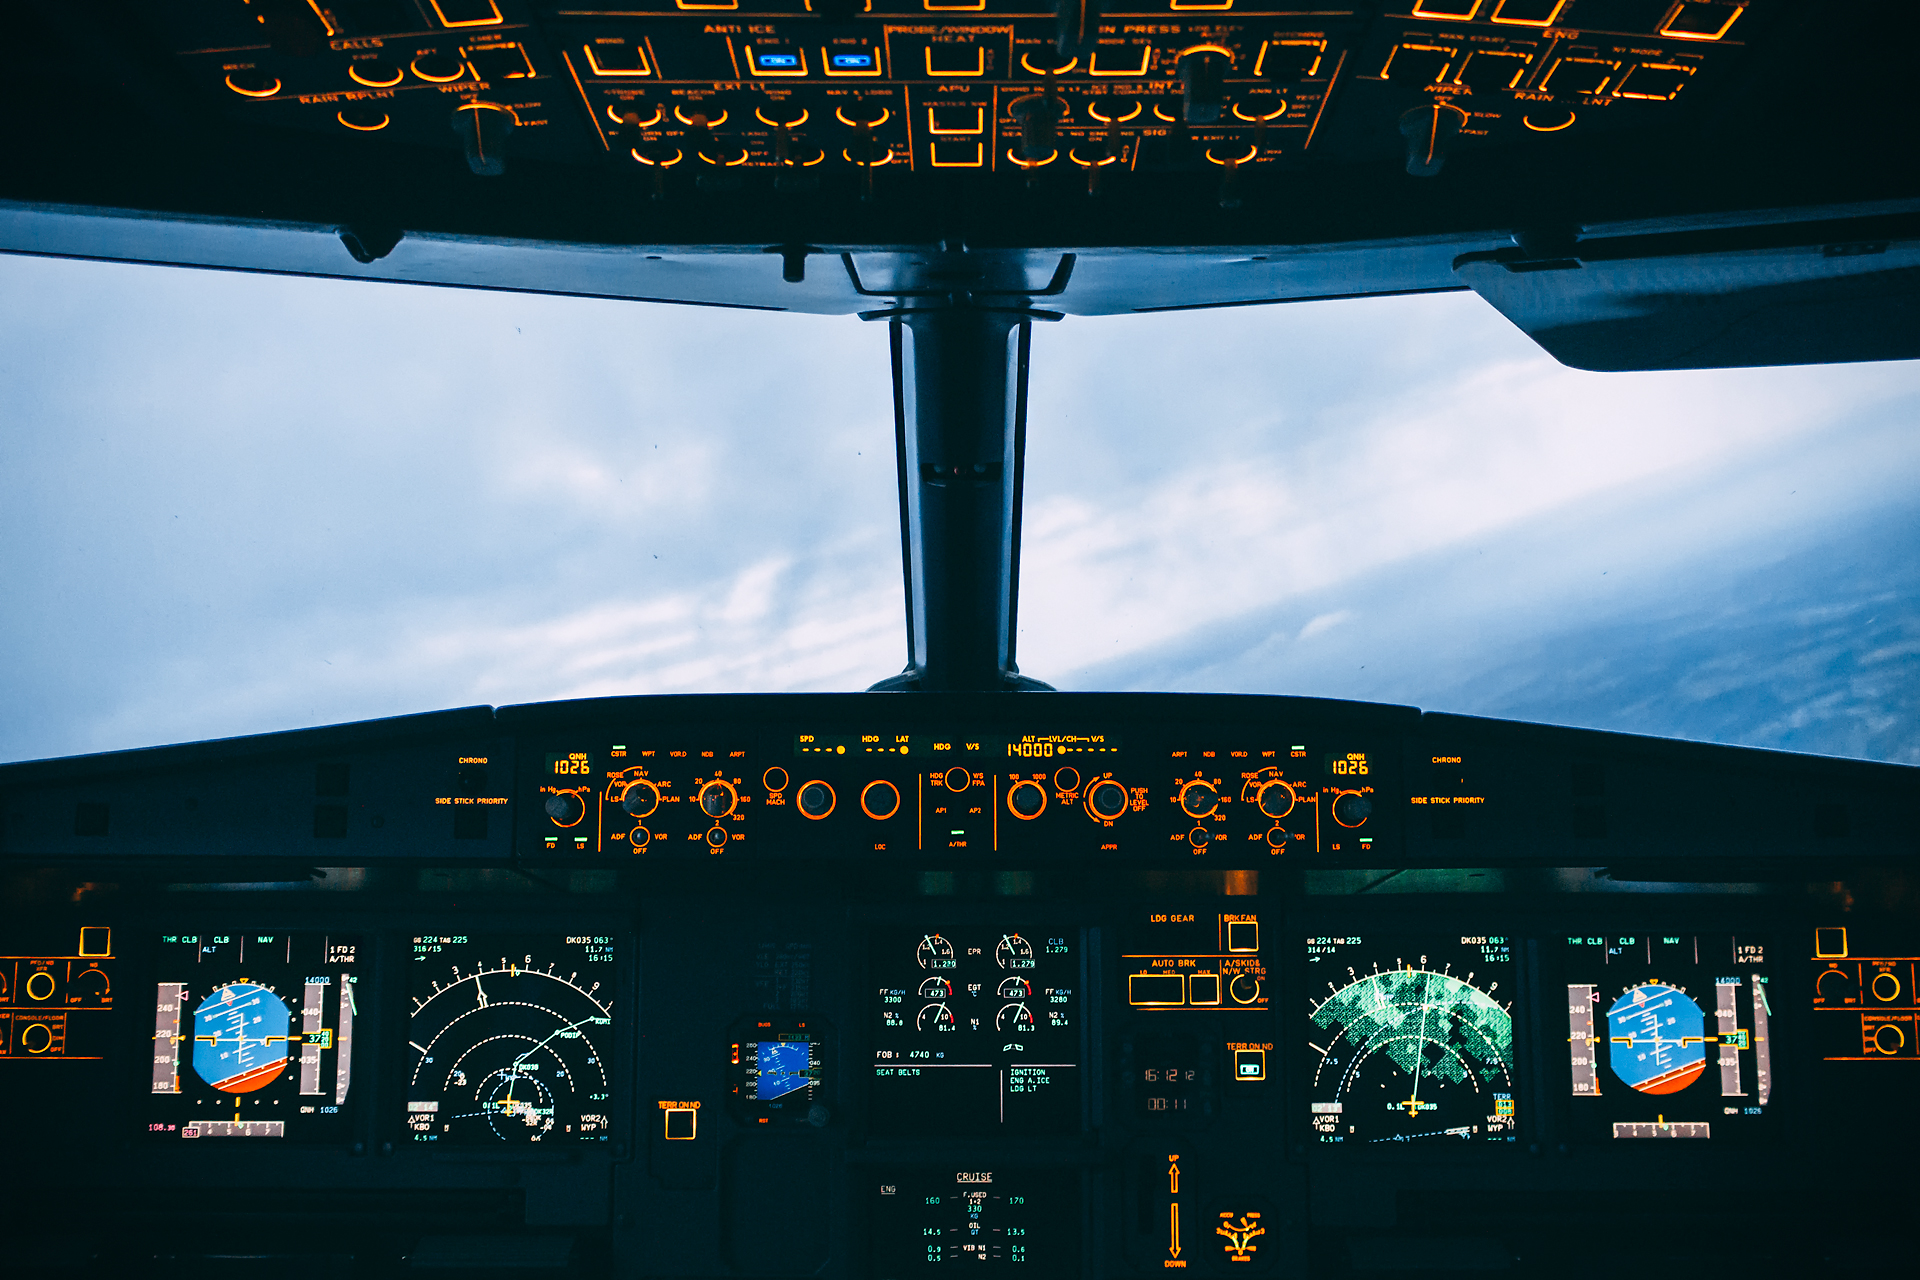 Cockpit Wallpaper High Definition Free Download Pilotstories